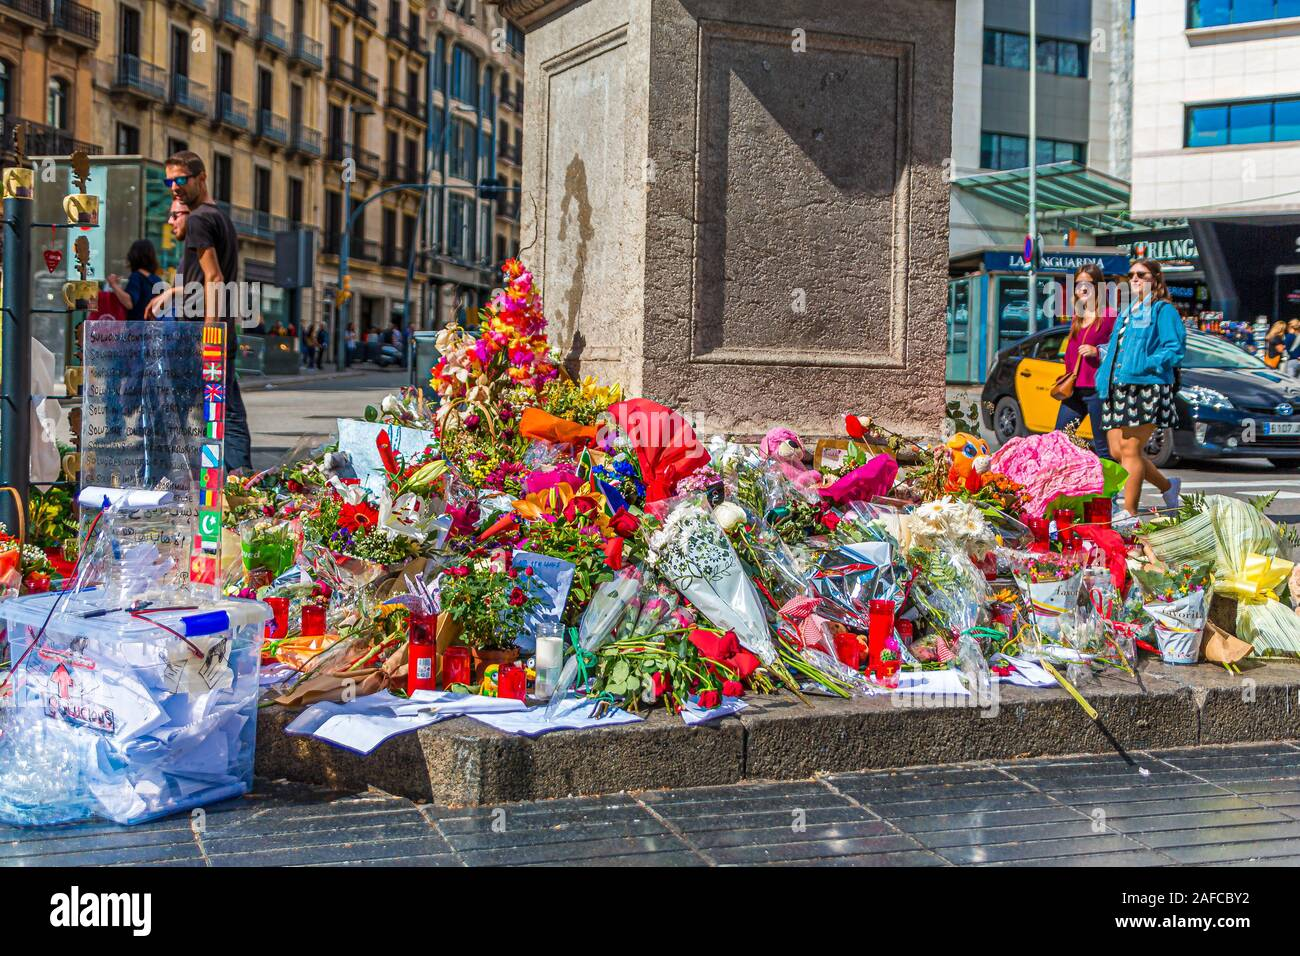 Attaque terroriste de Barcelone Memorial Banque D'Images